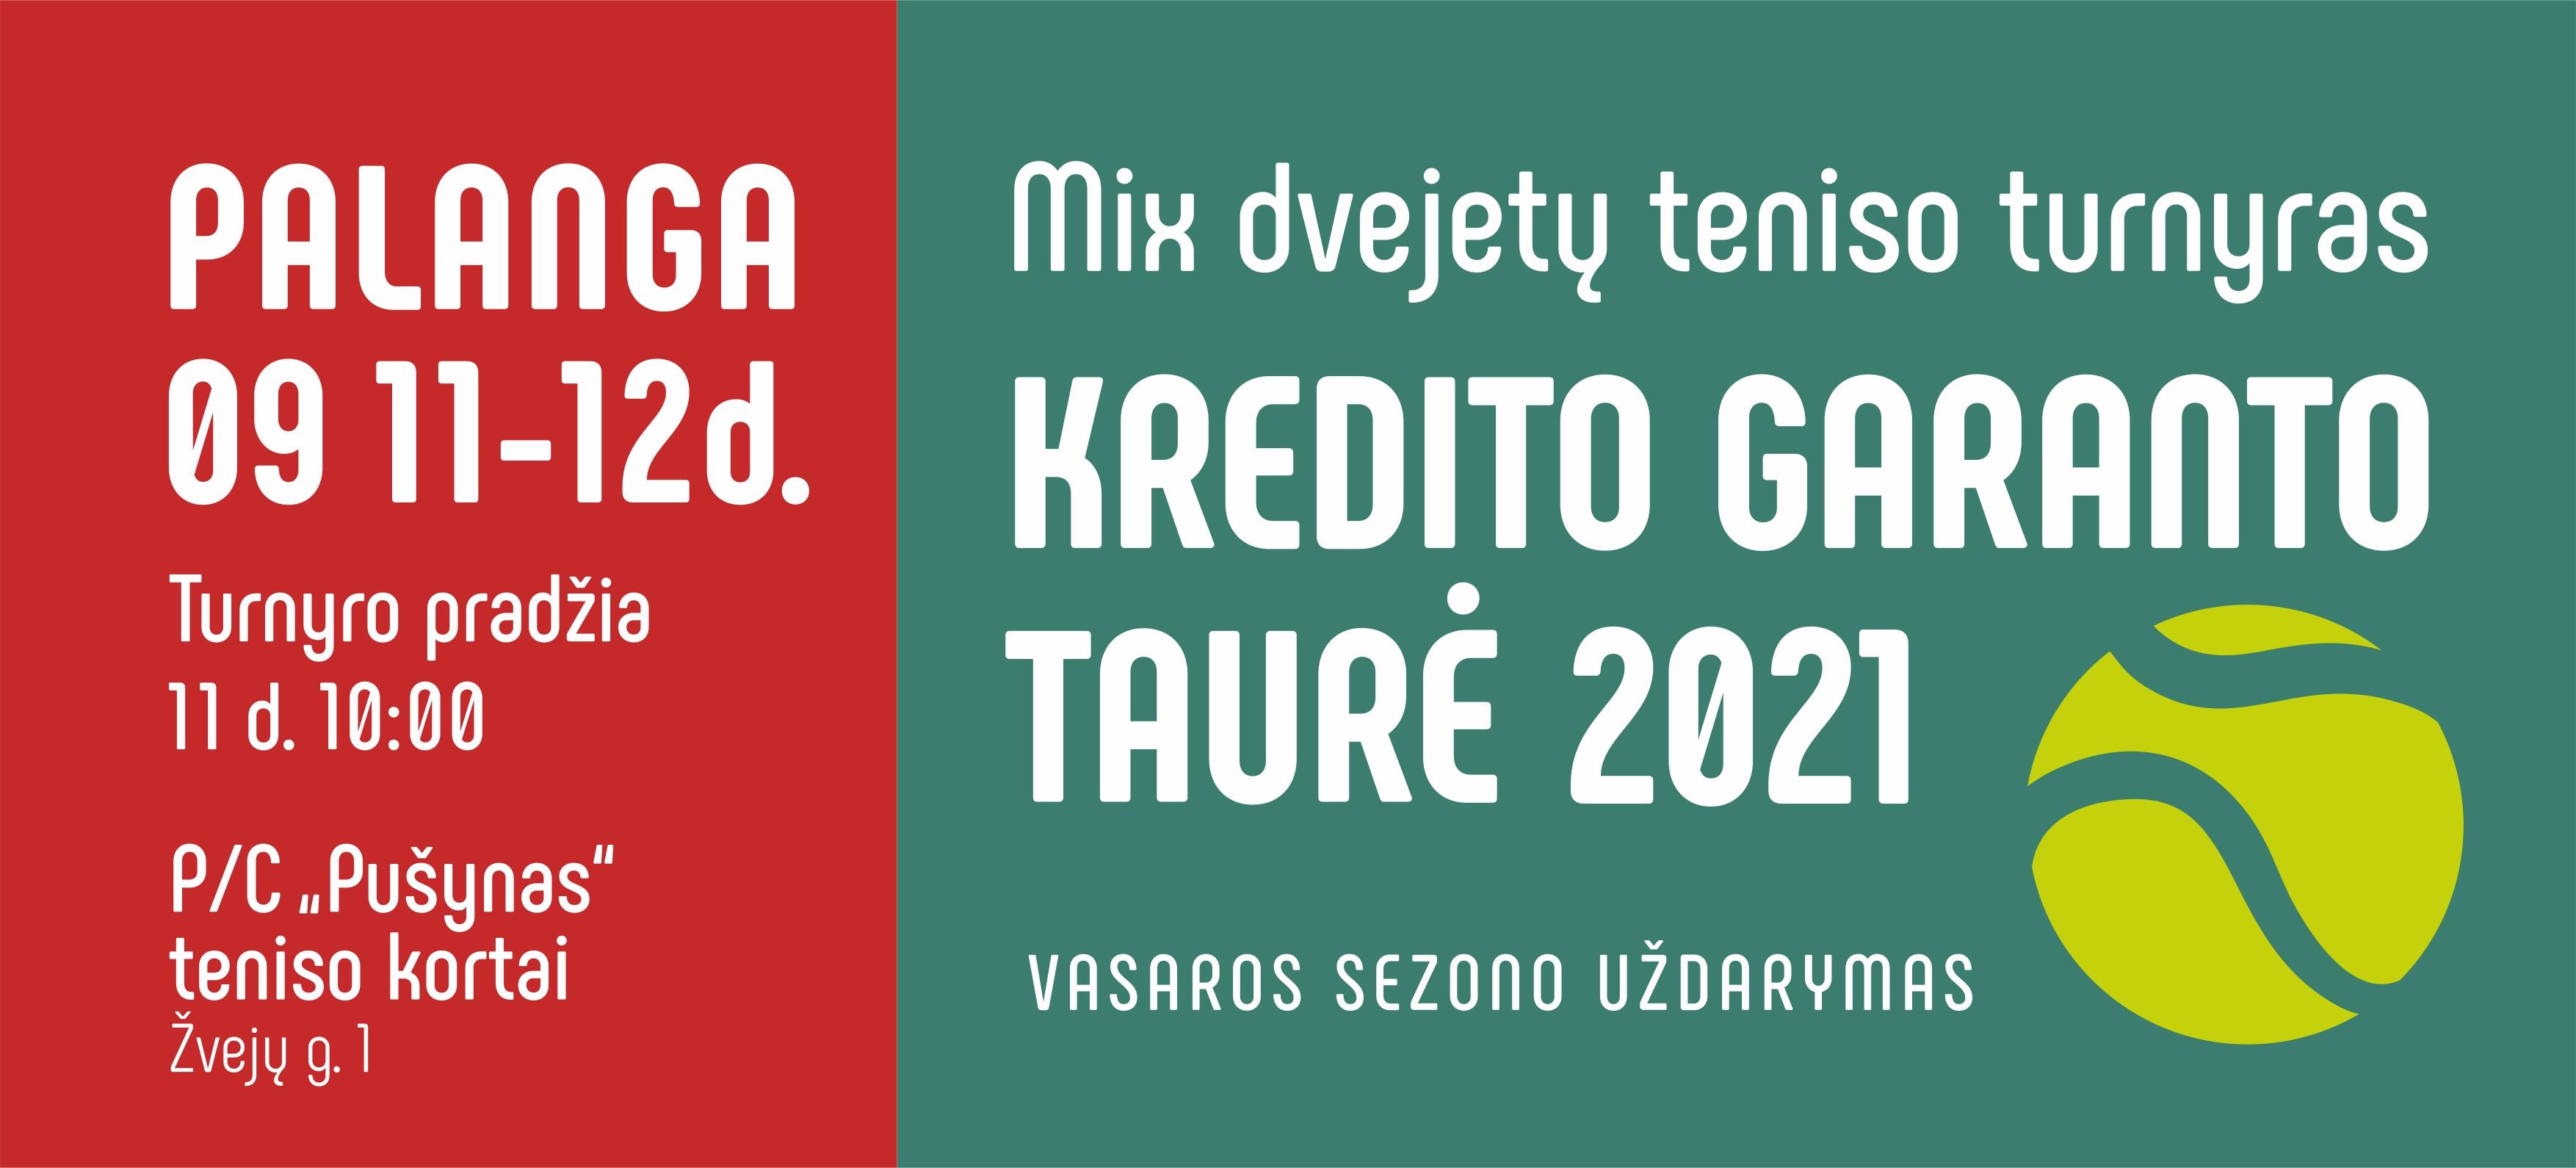 Kredito garanto taure 2021_baneris